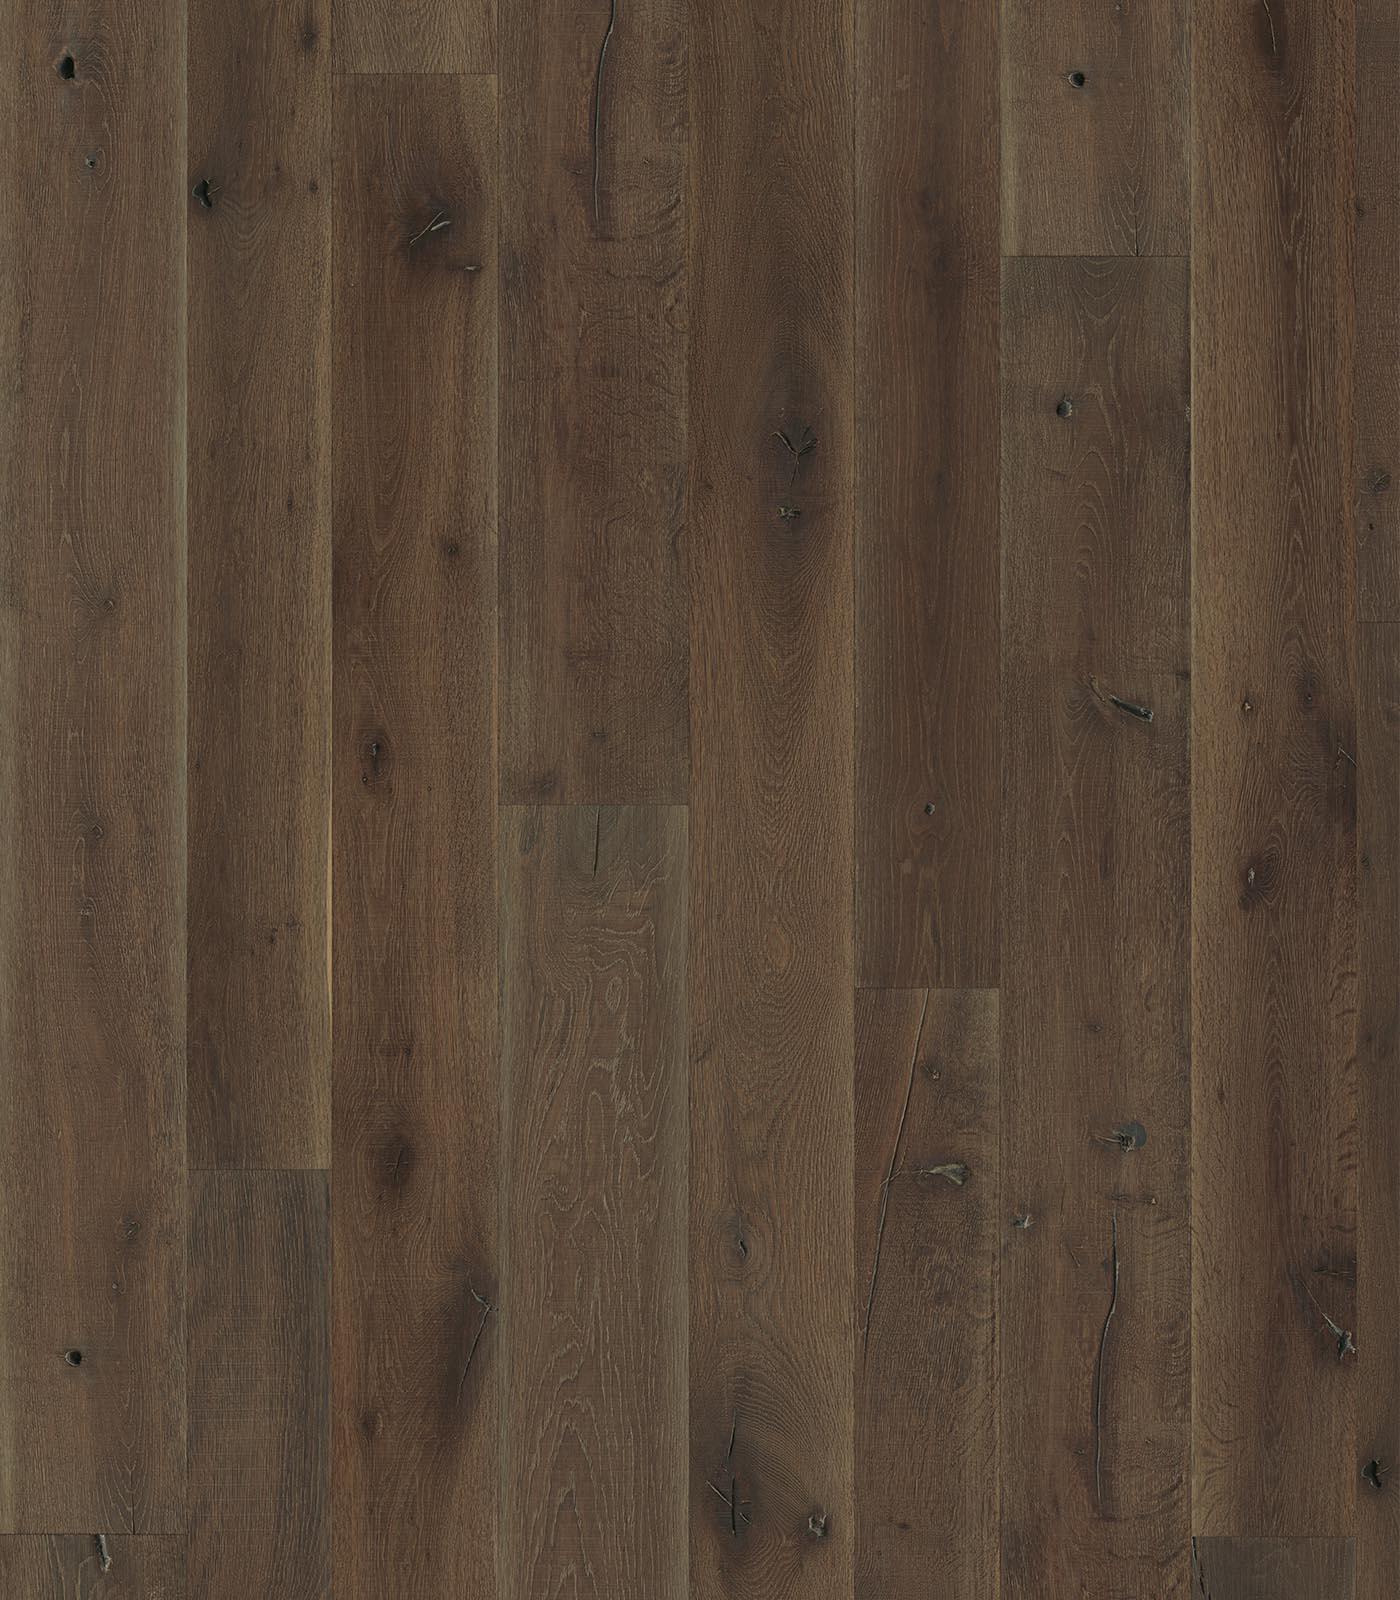 Segovia-Heritage Collection-European Oak Floors-flat